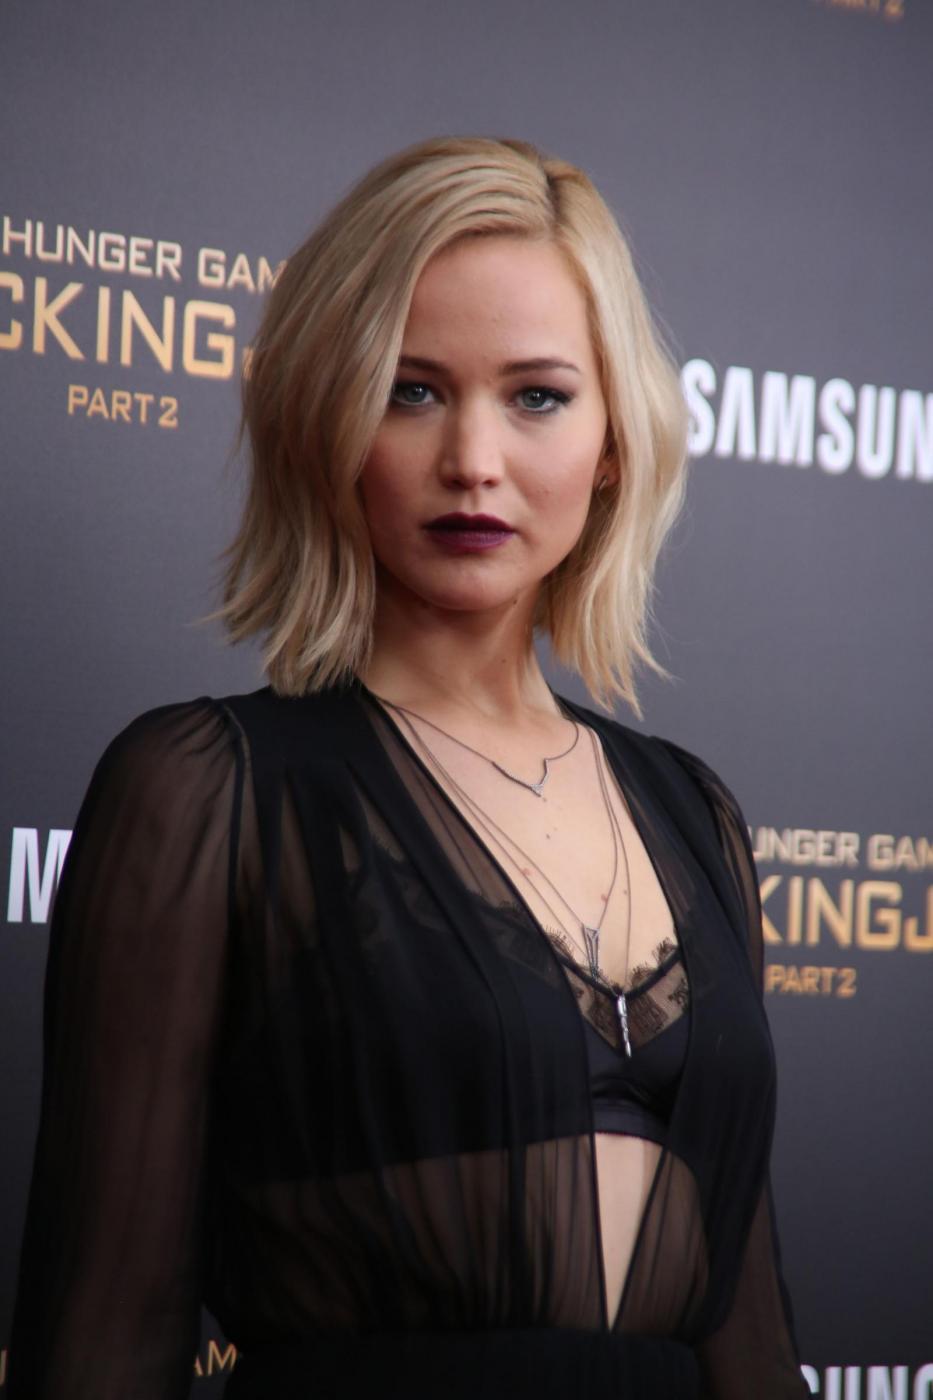 Jennifer Lawrence: reggiseno in bella vista a New York FOTO